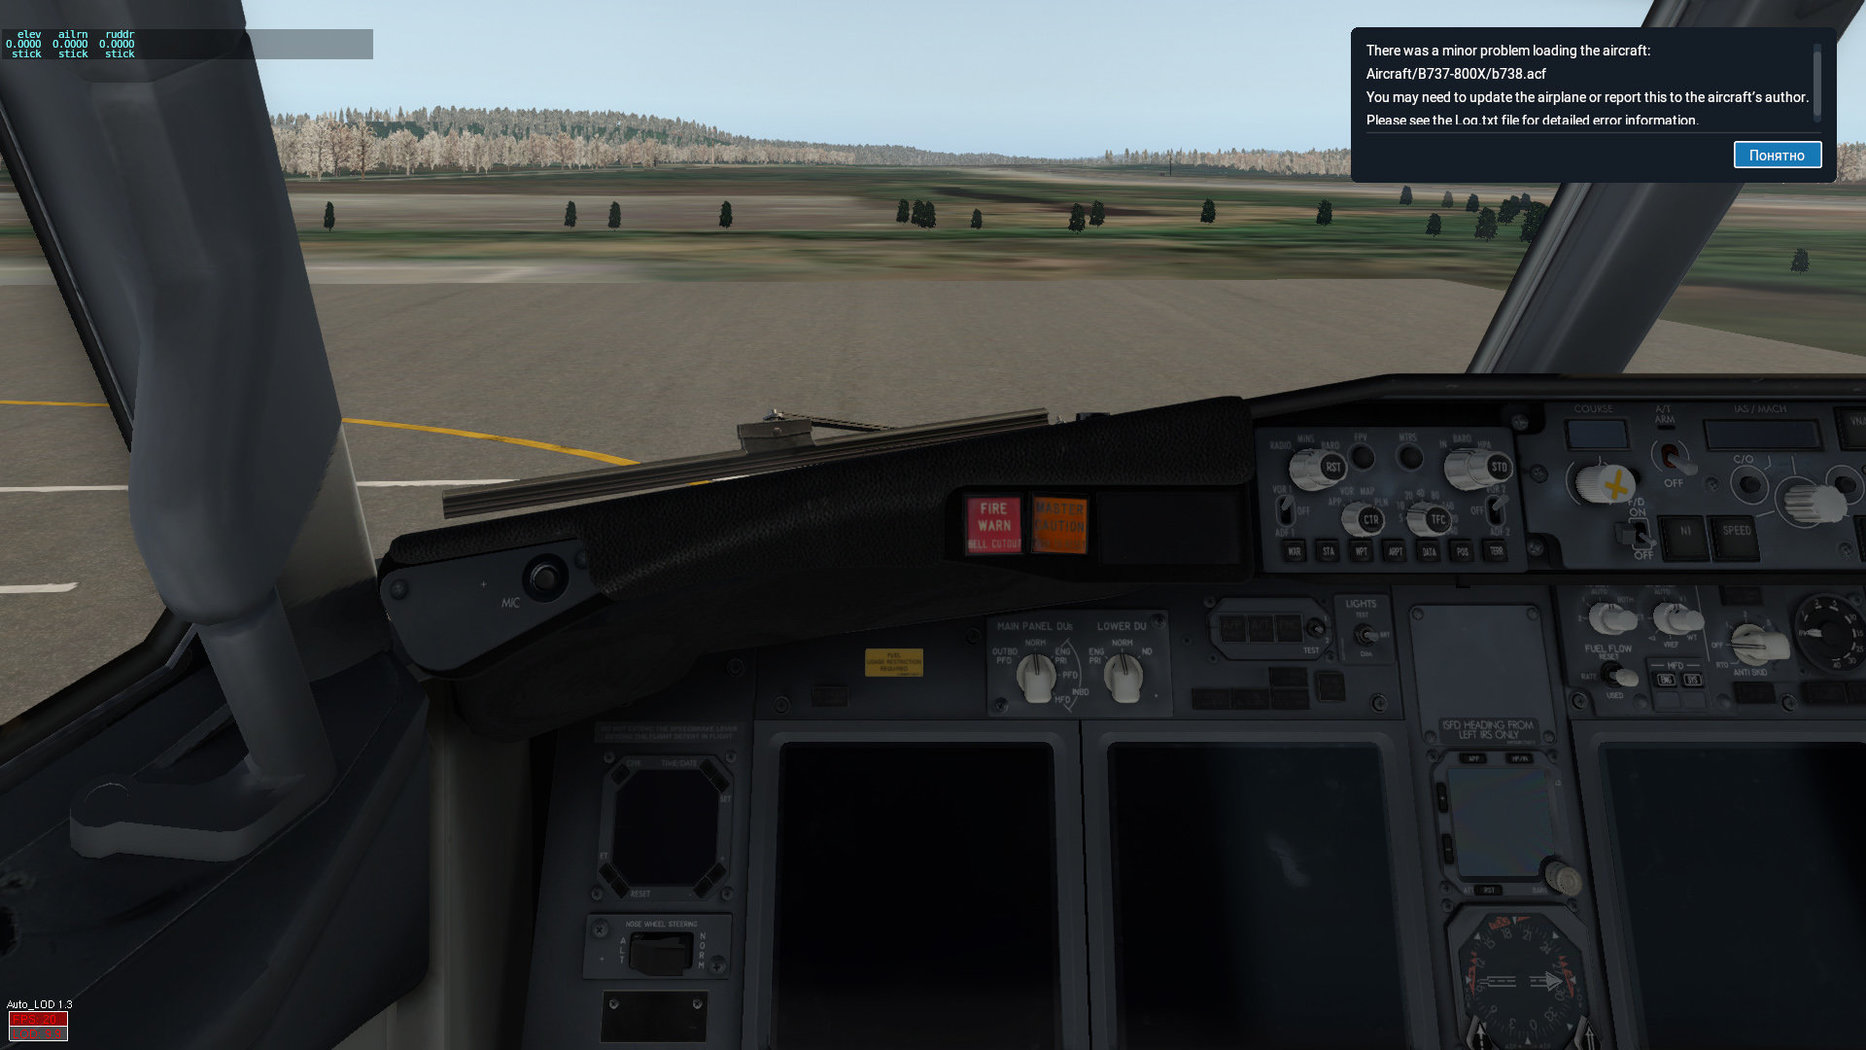 737-1.thumb.jpg.cf2a89bfa5fcf0c6851ee1fb1a4c724a.jpg